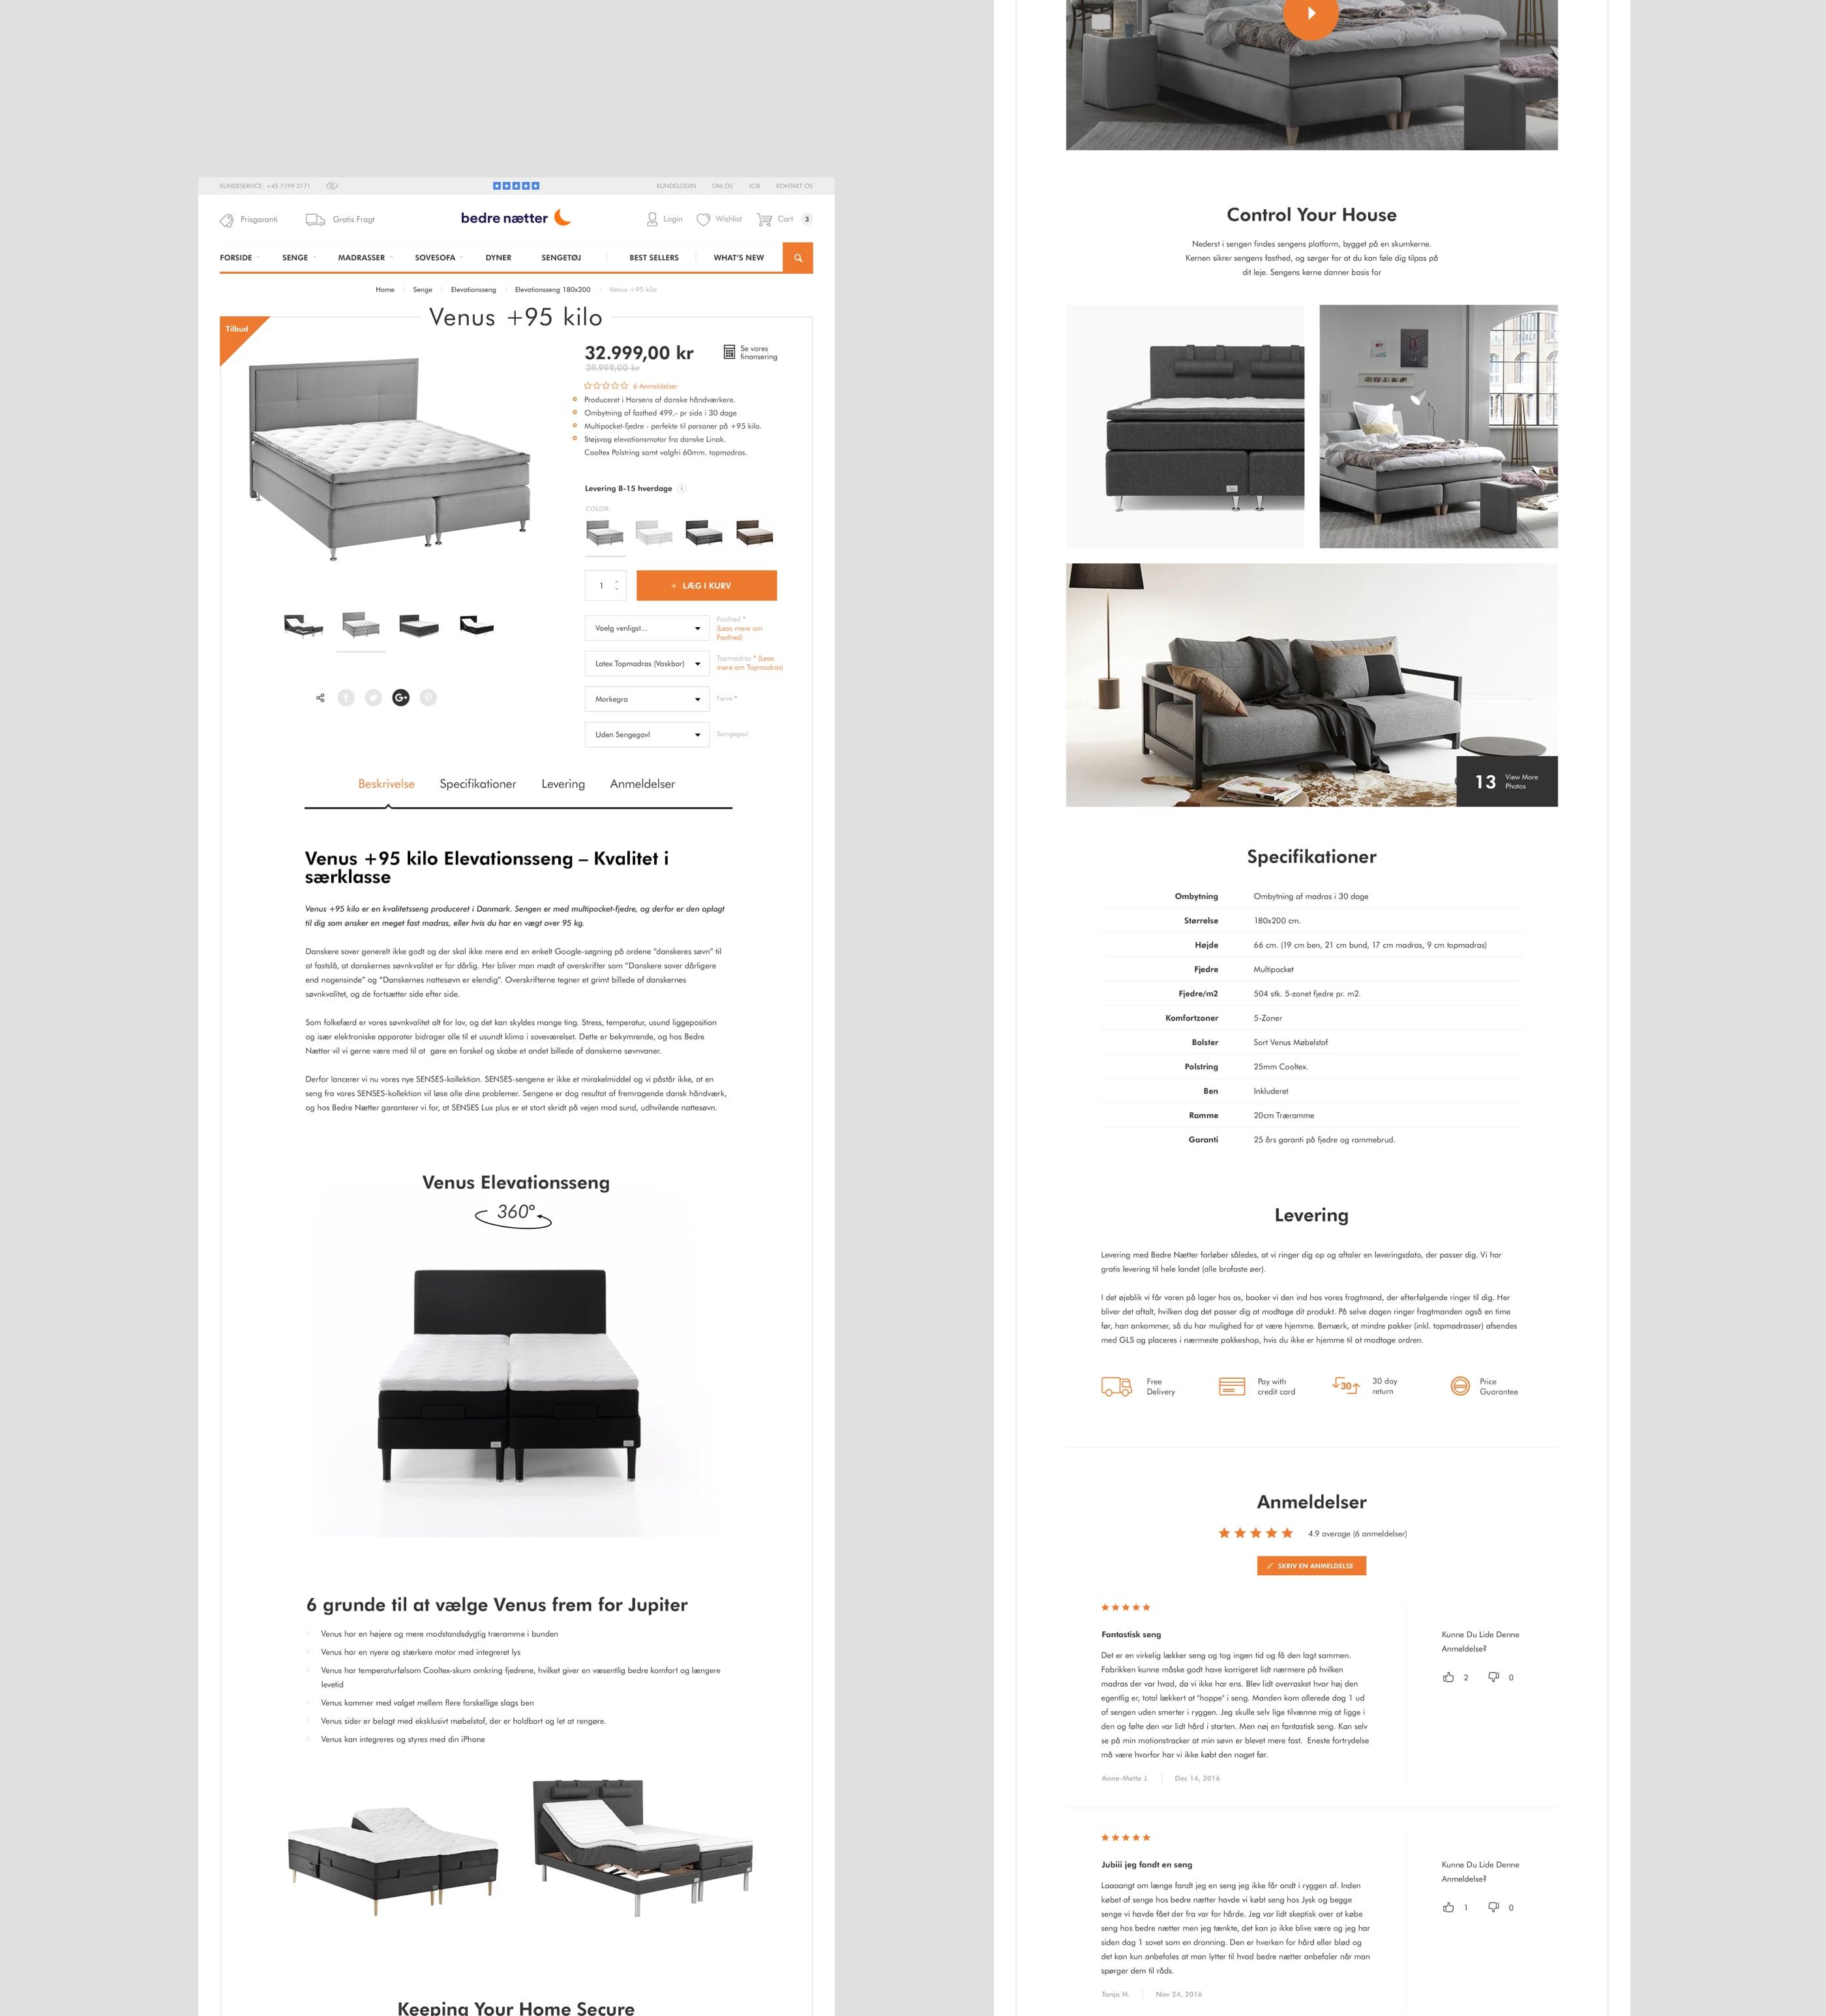 16_02_product_page_for Bedre Nætter magento website_by_basov_design_